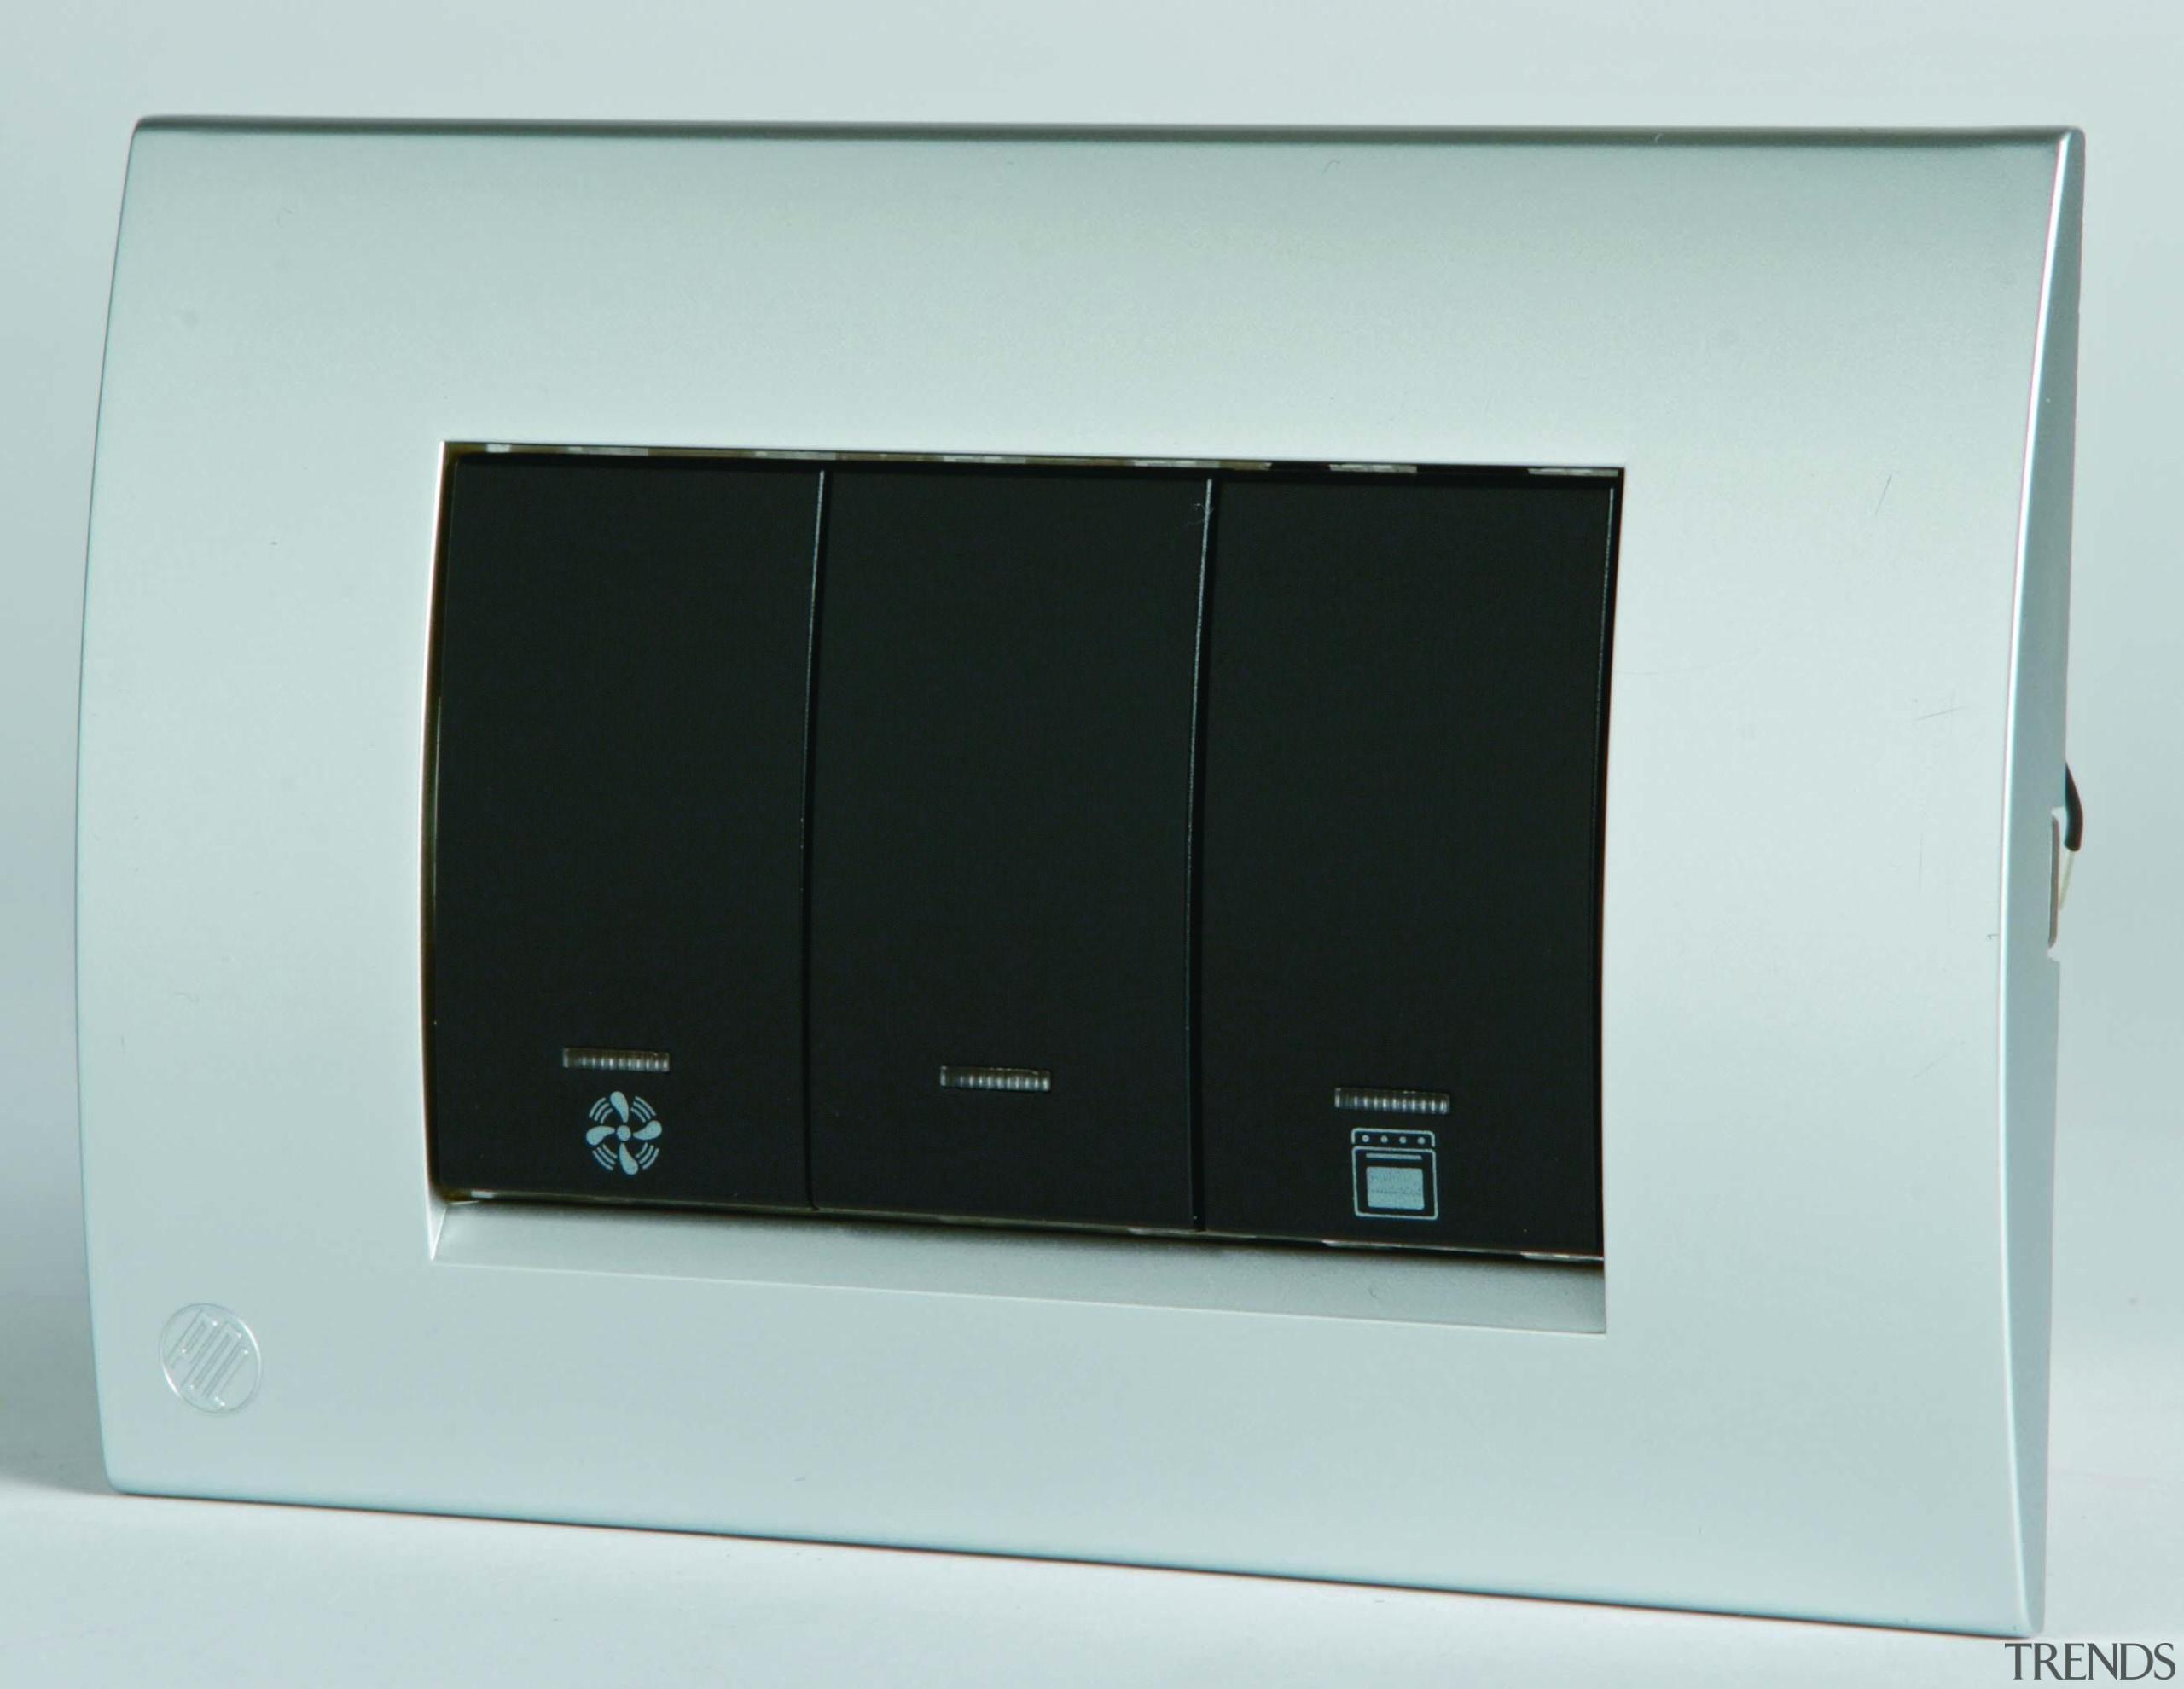 Modena triple switch, light, fan, oven - Black display device, electronic device, technology, white